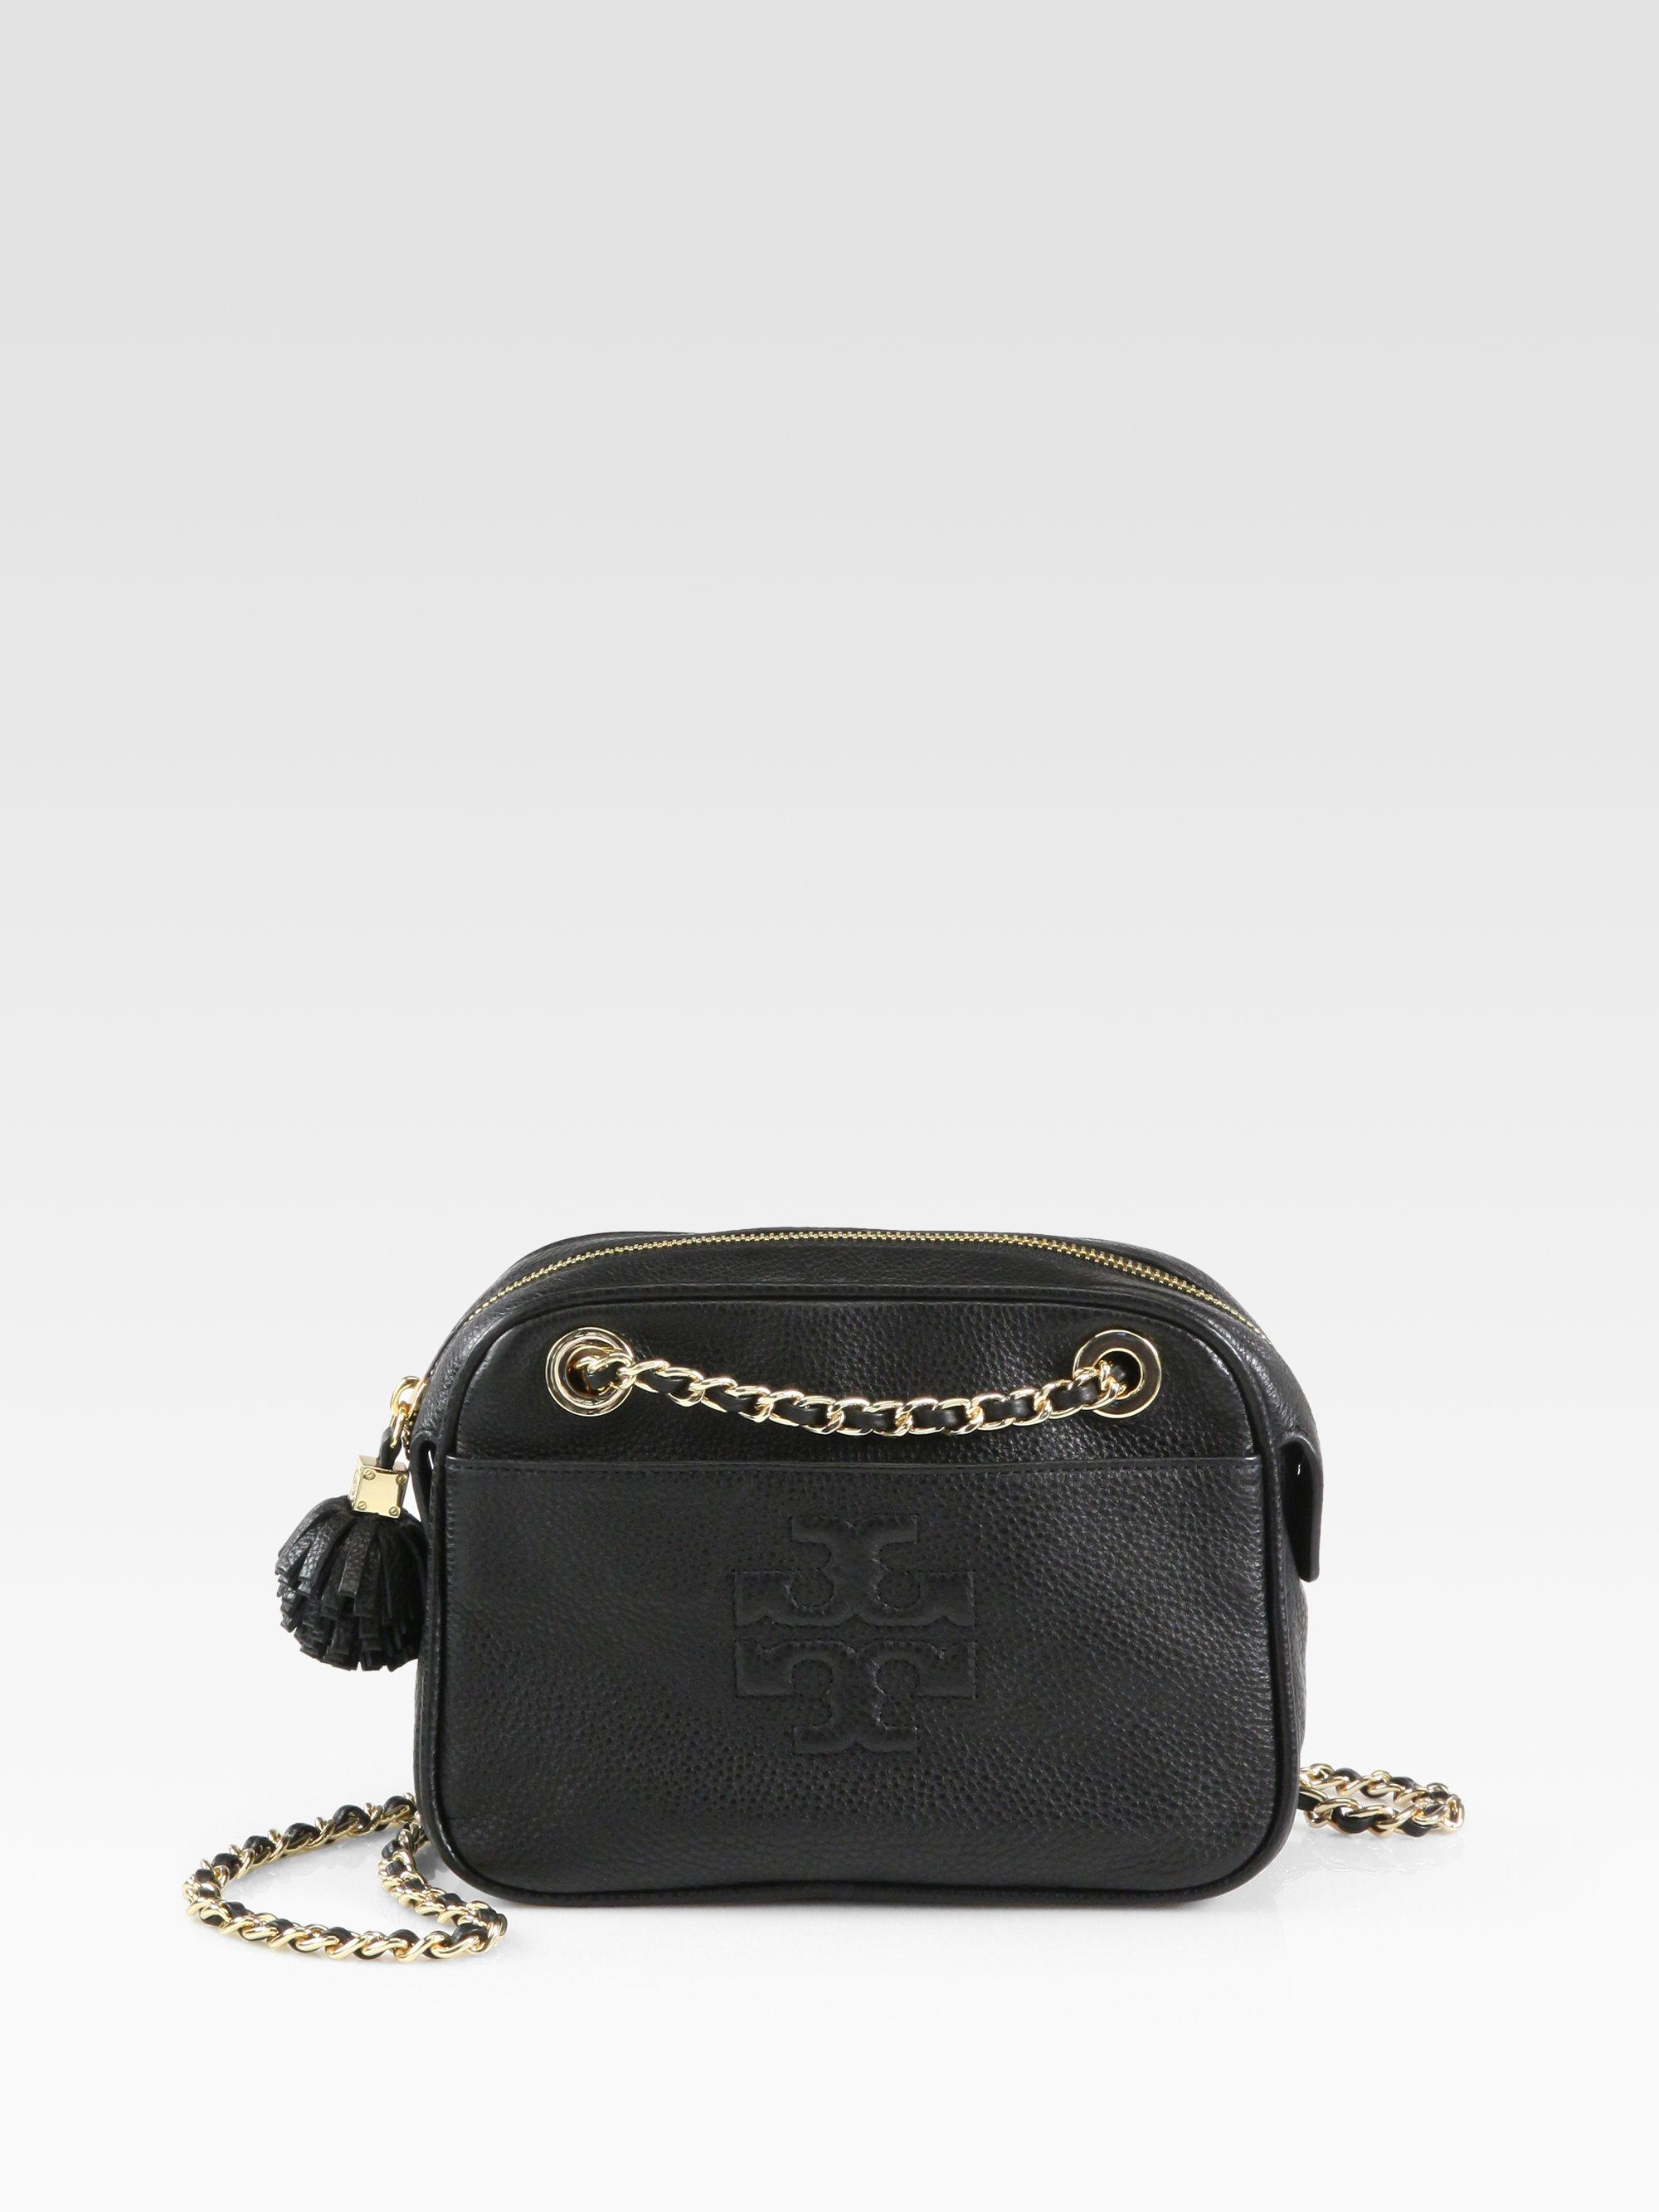 e28914a286d Tory Burch Thea Crossbody Chain Bag in Black - Lyst